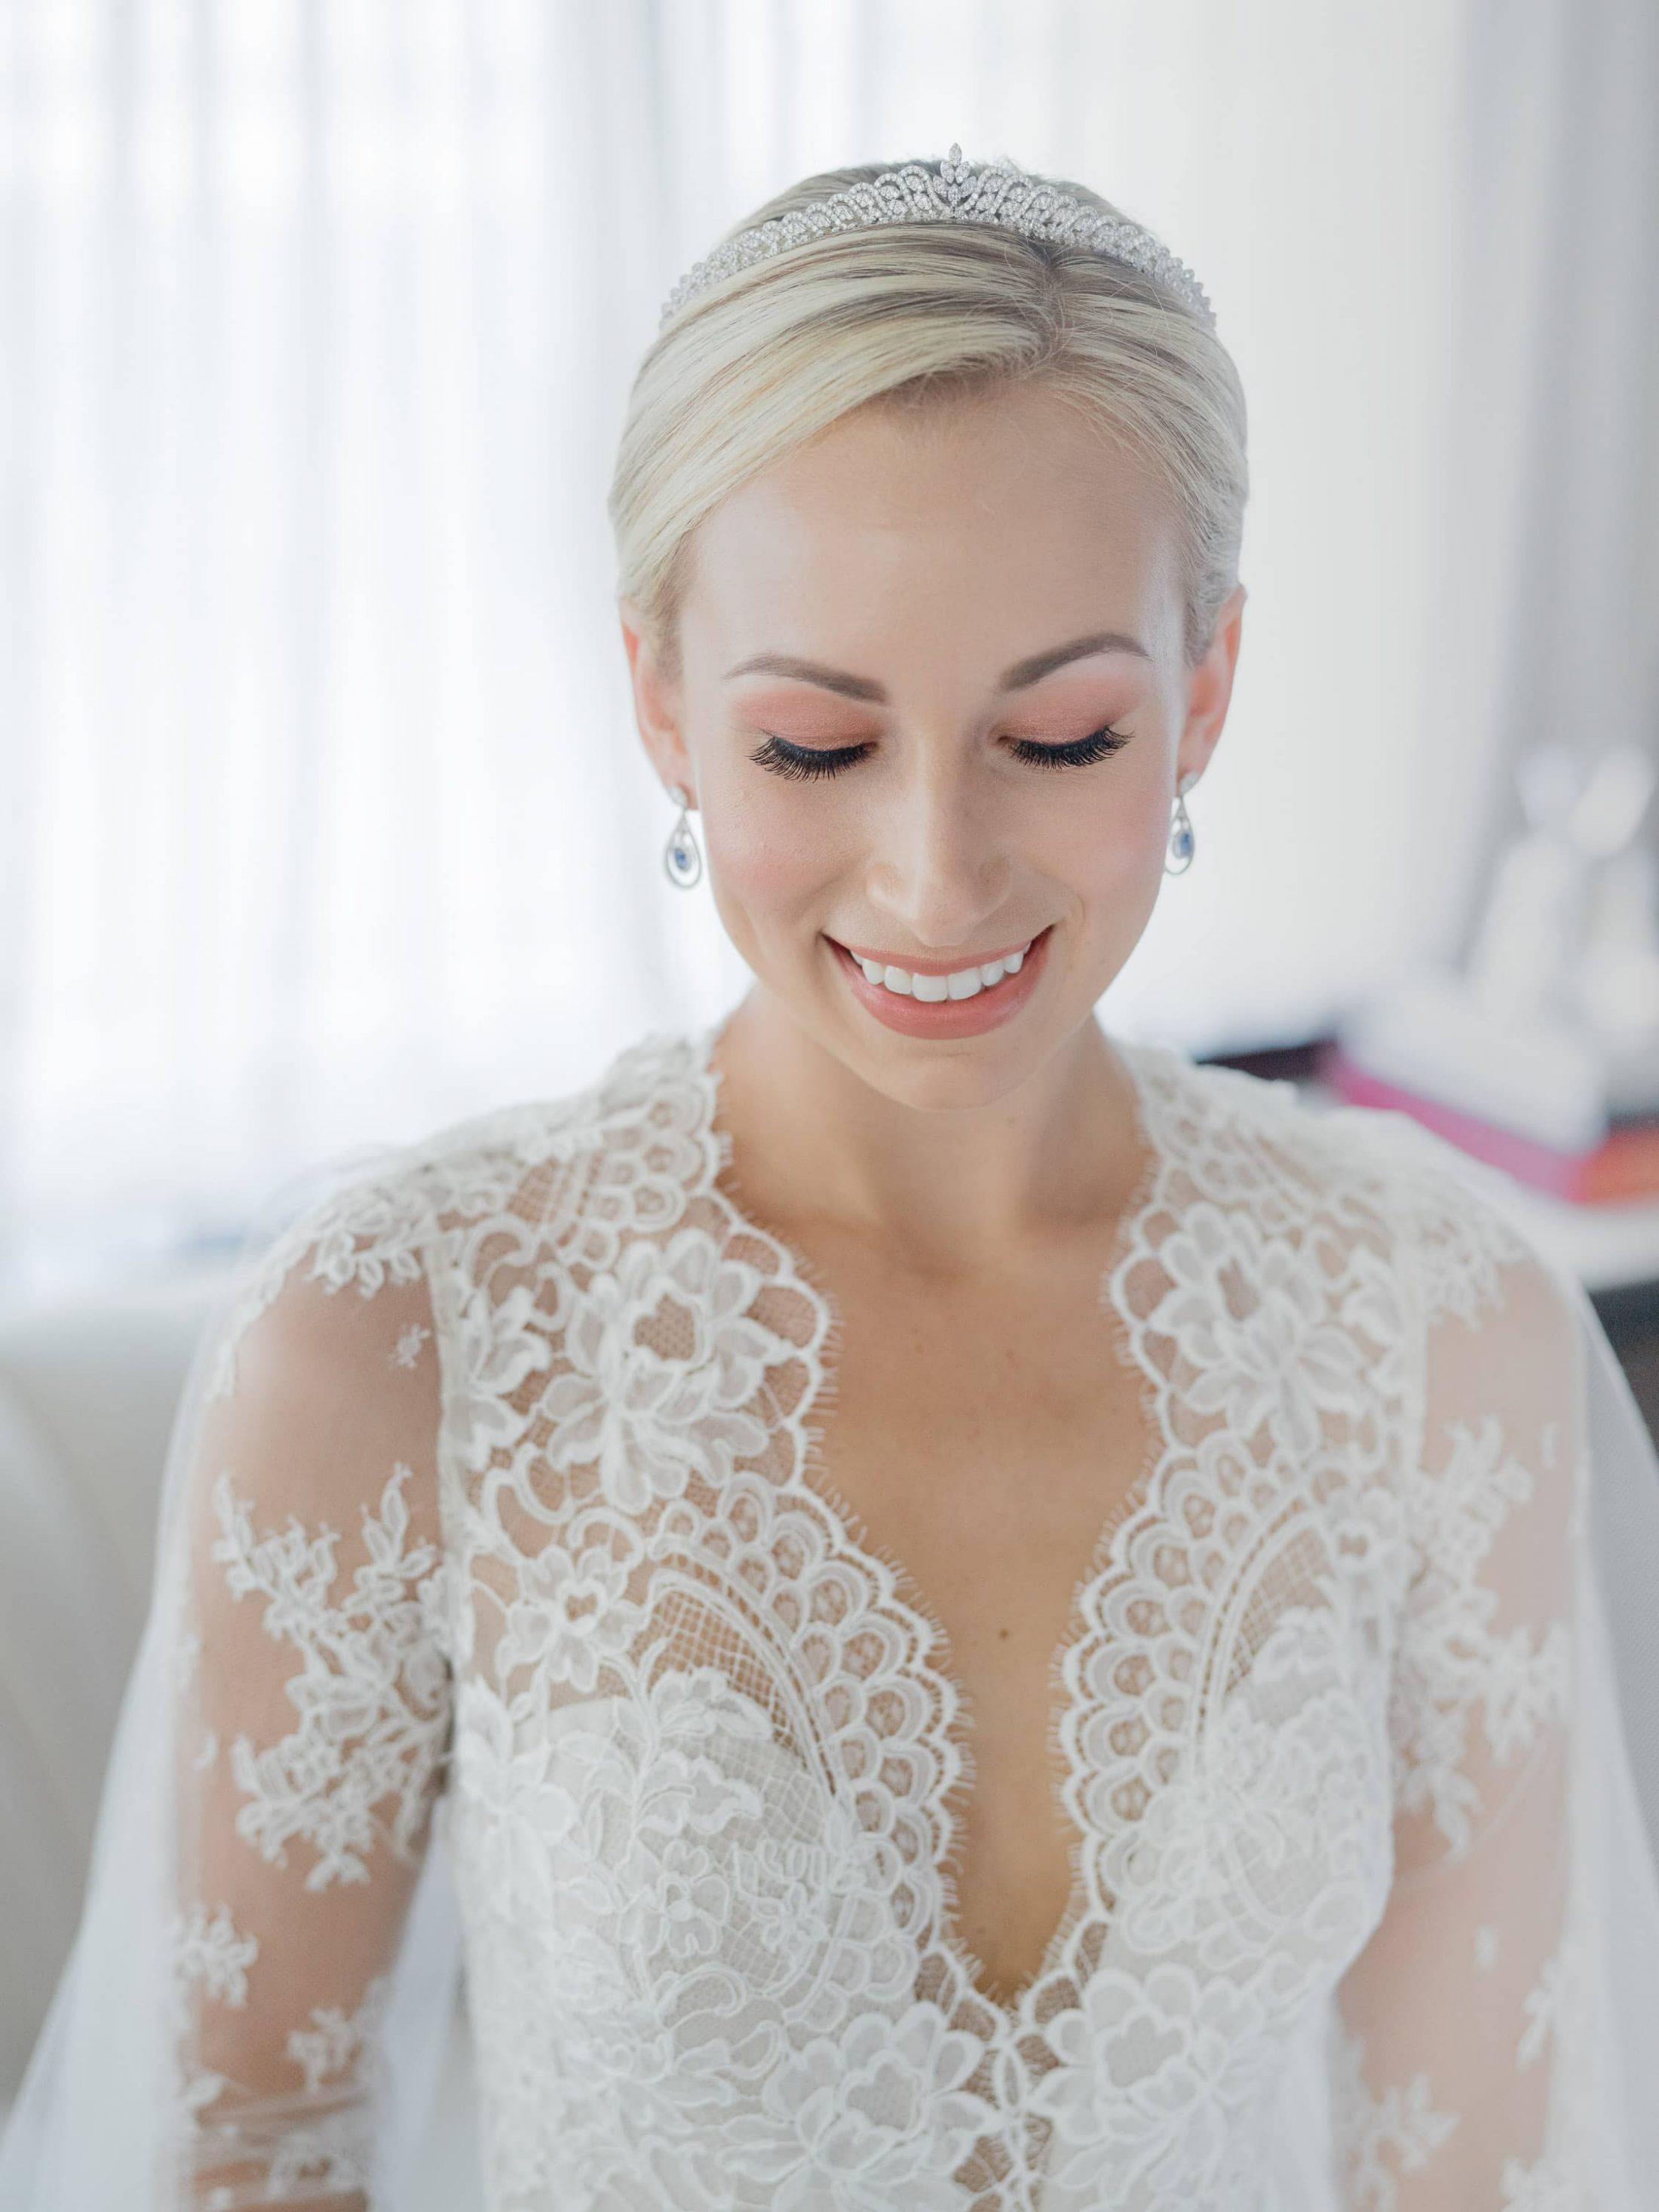 Bride make-up at this Miami yacht wedding | Photo by Corbin Gurkin